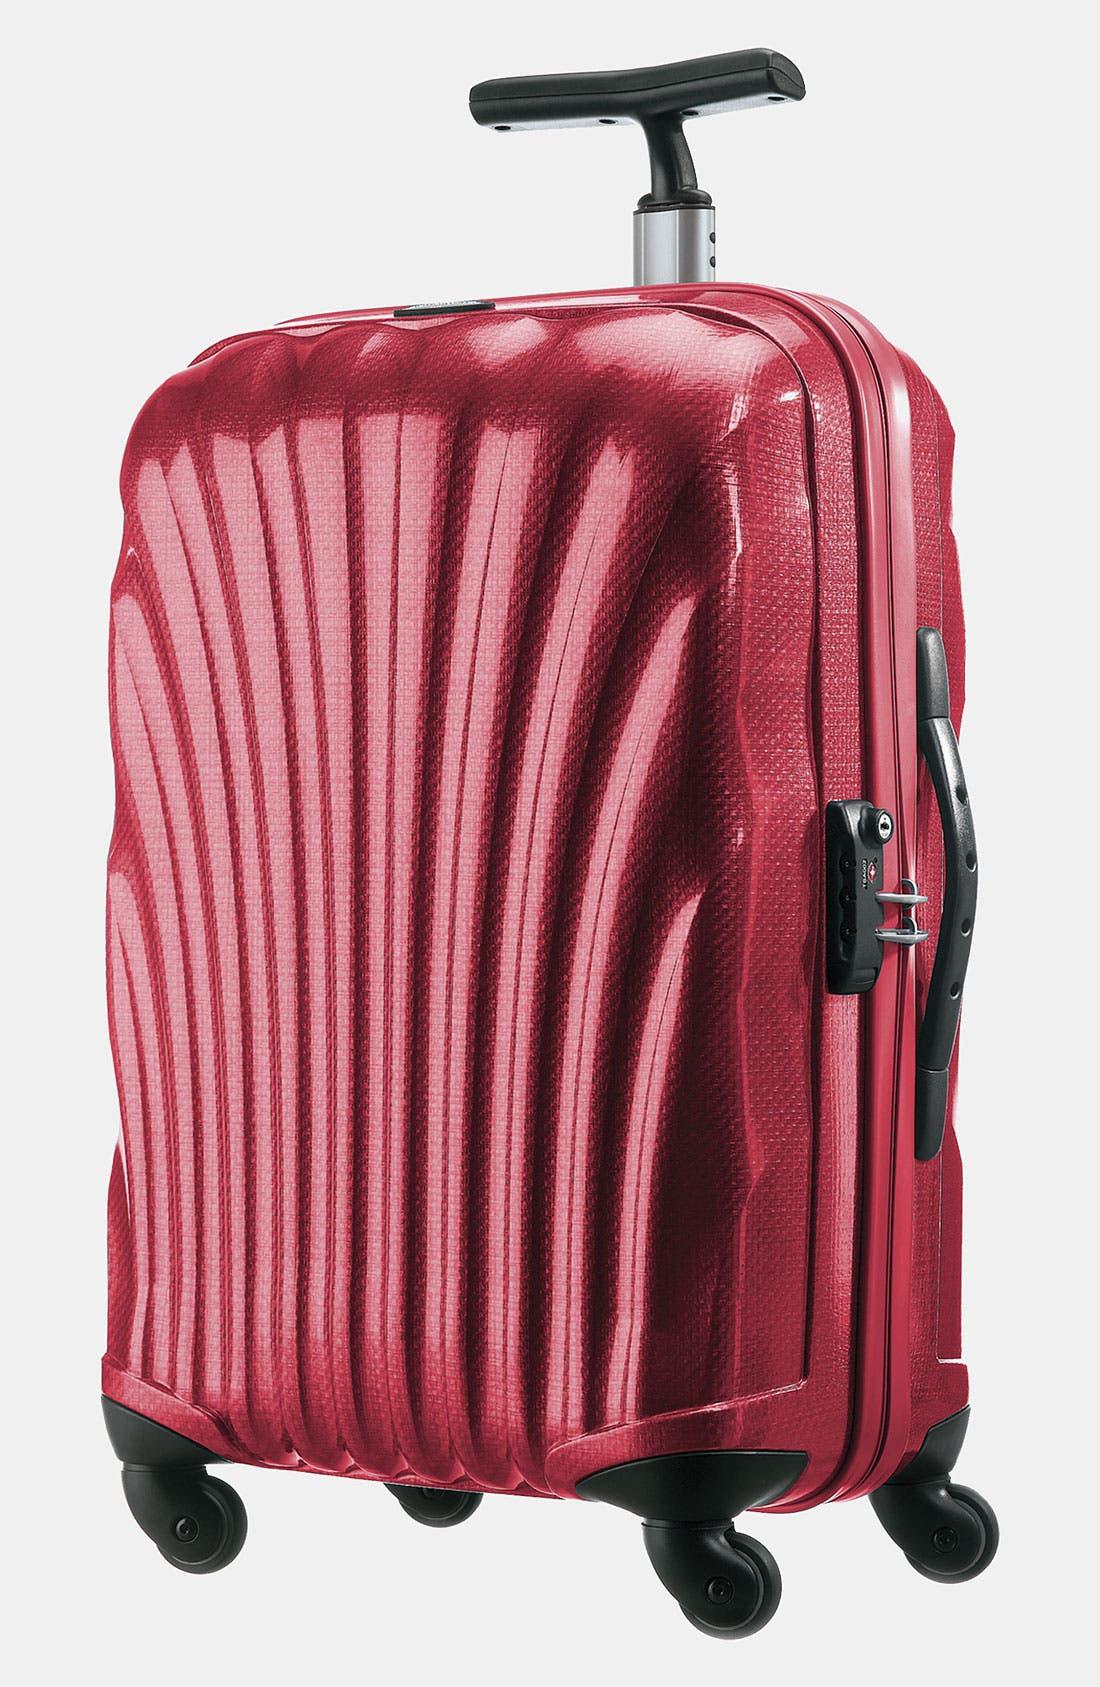 Alternate Image 1 Selected - Samsonite 'Cosmolite' Rolling Suitcase (32 Inch)